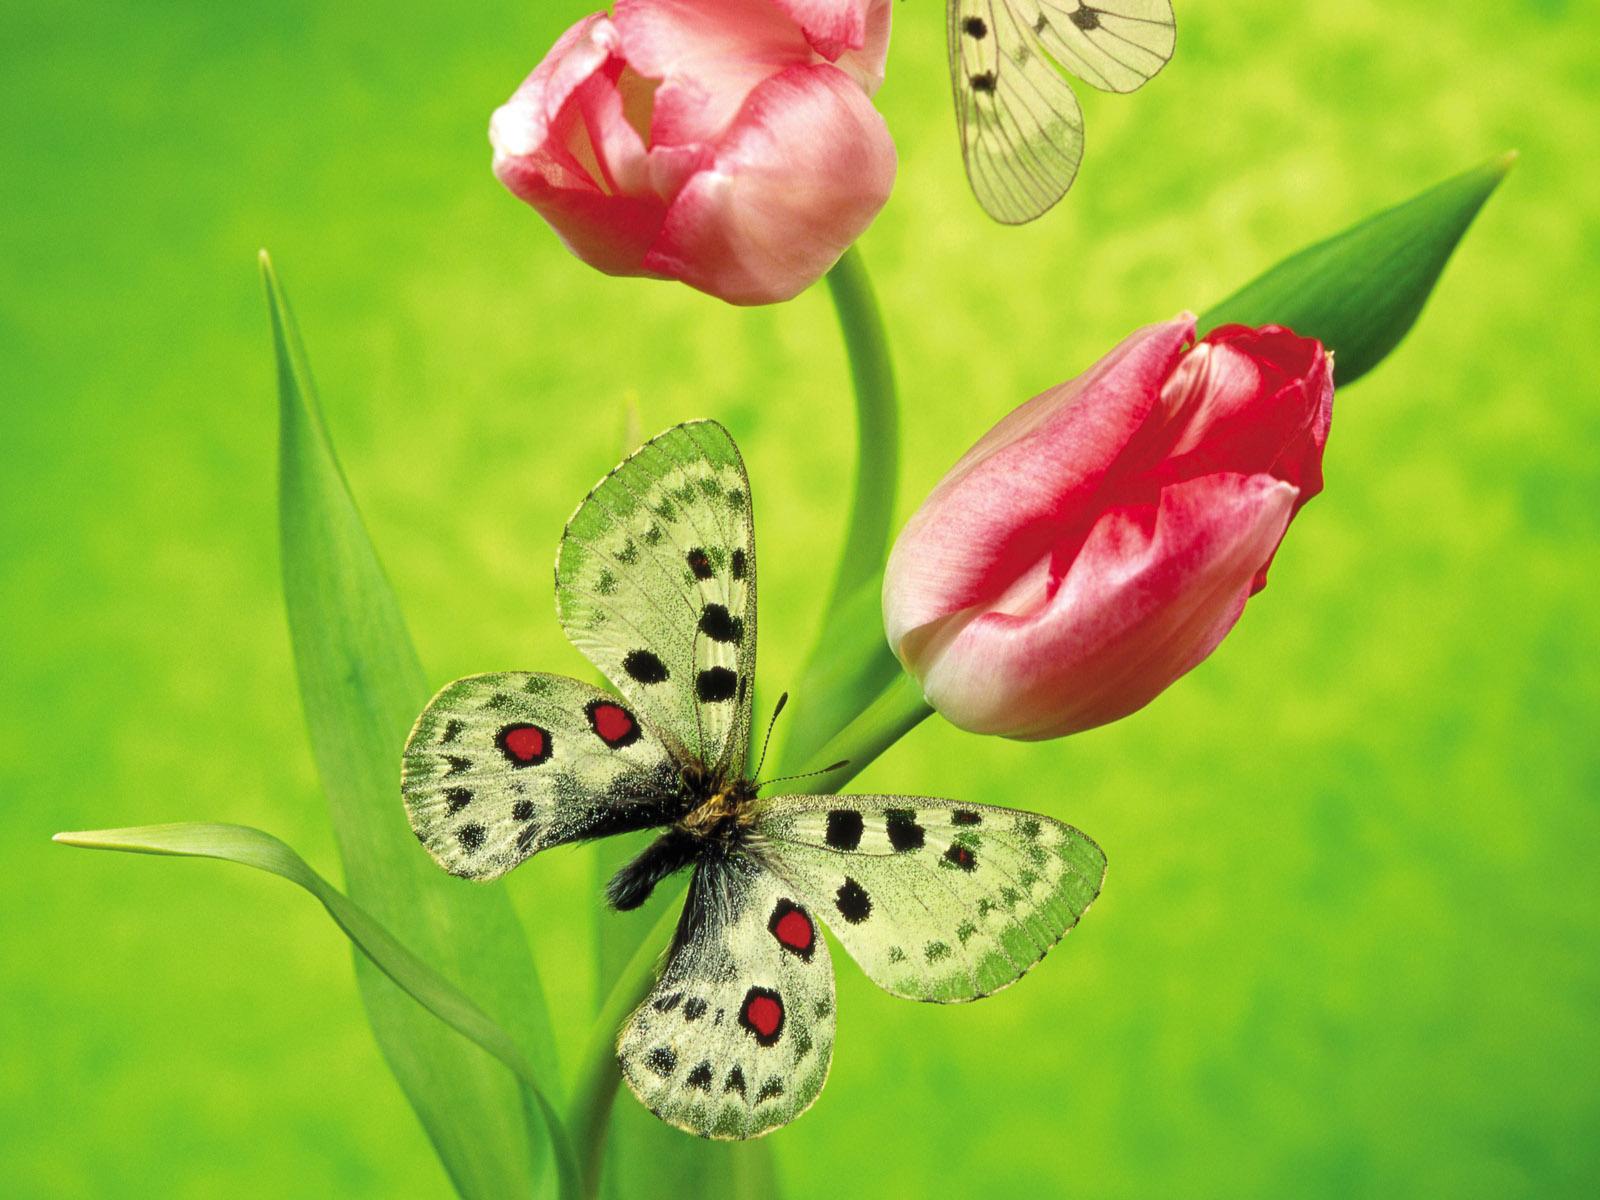 https://4.bp.blogspot.com/-ACjYxS5l27A/TsuevmBoVsI/AAAAAAAABGo/49GdggNt-HI/s1600/Butterfly%2Bwallpaper%2Bfor%2Bhome.jpg